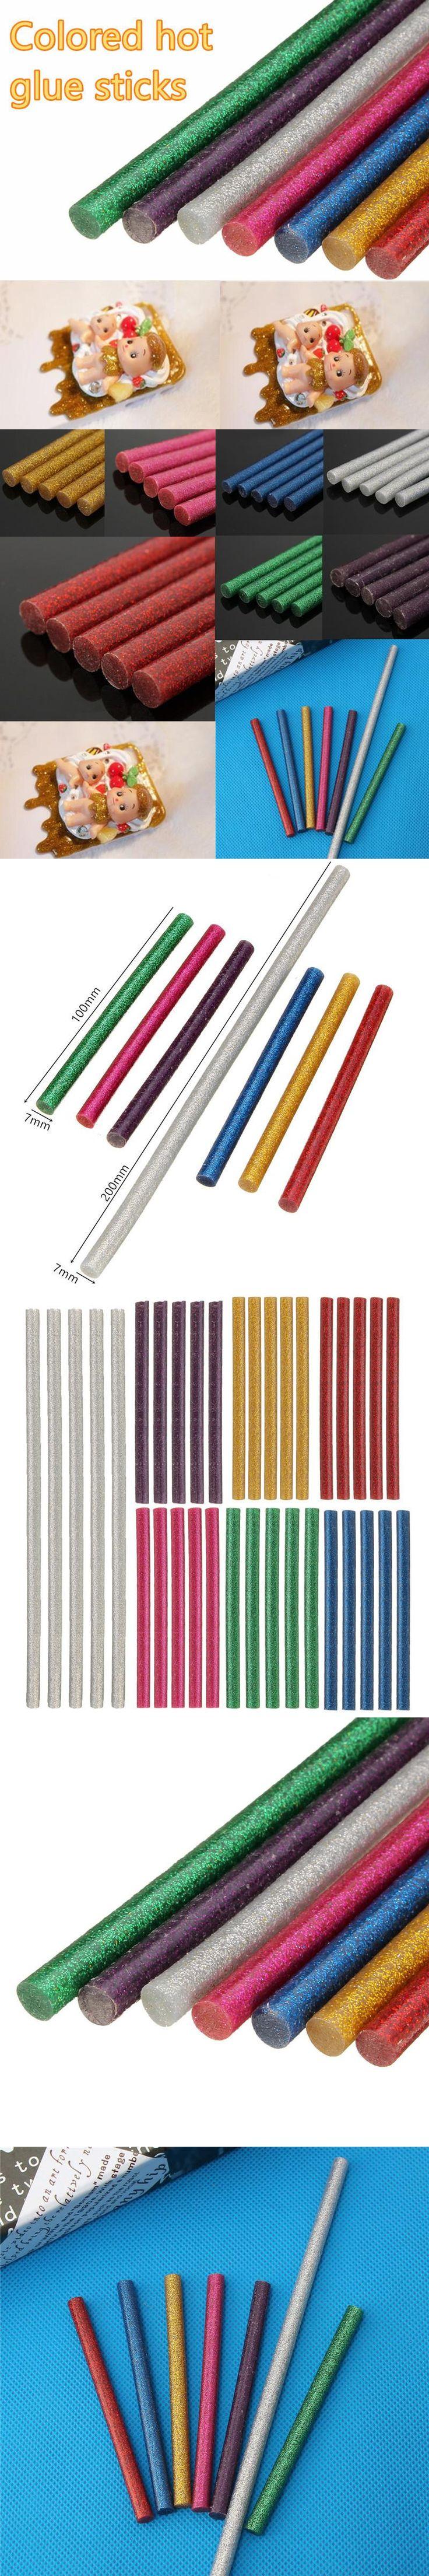 5 pcs 7x100mm 7x200mm Hot Melt Glue Sticks For Electric Glue Gun Car Audio Craft Repair General Purpose Adhesive Sticks